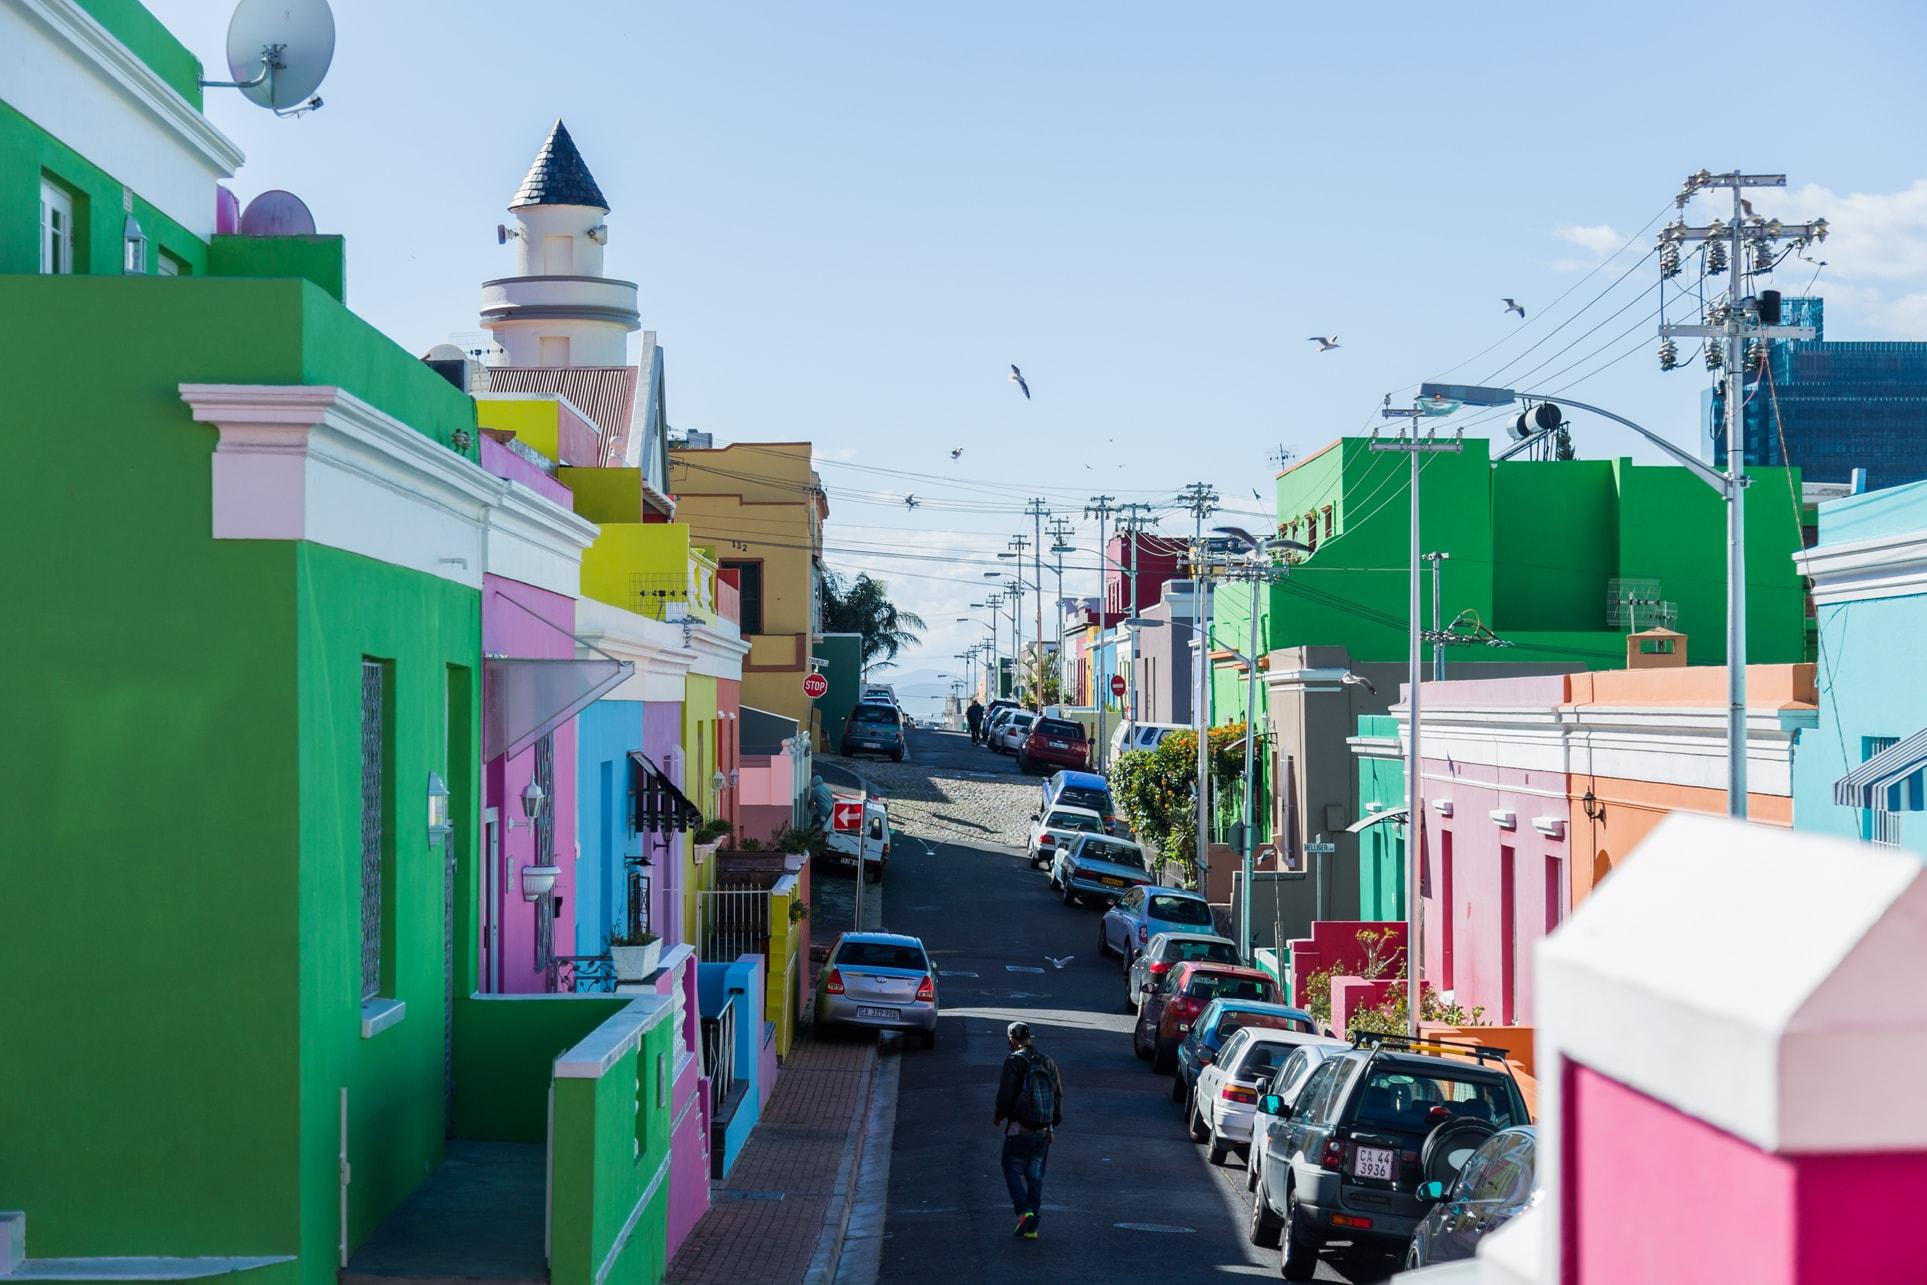 Ta1 op Attractions - Bo Kaap - Bo-Kaap-Neighborhood-Street-Cars-Houses.jpg-min.jpg